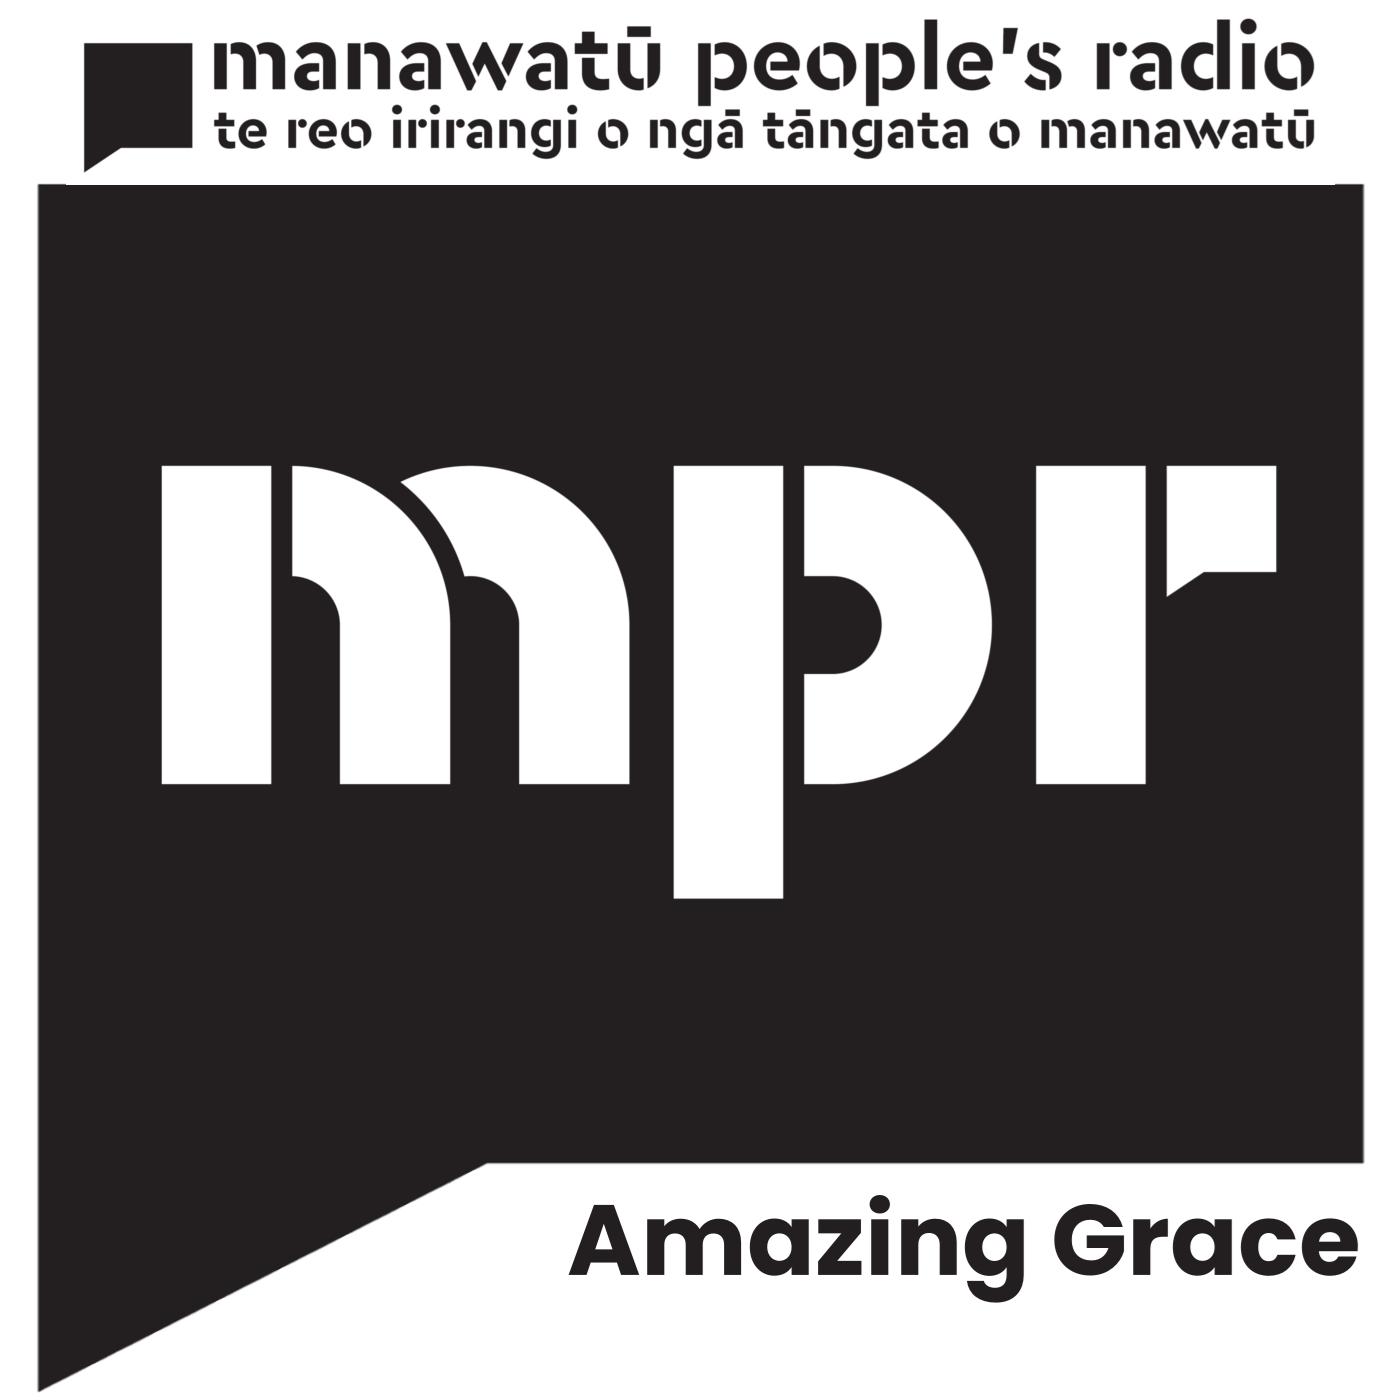 https://cdn.accessradio.org/StationFolder/manawatu/Images/MPRAmazingGrace.png